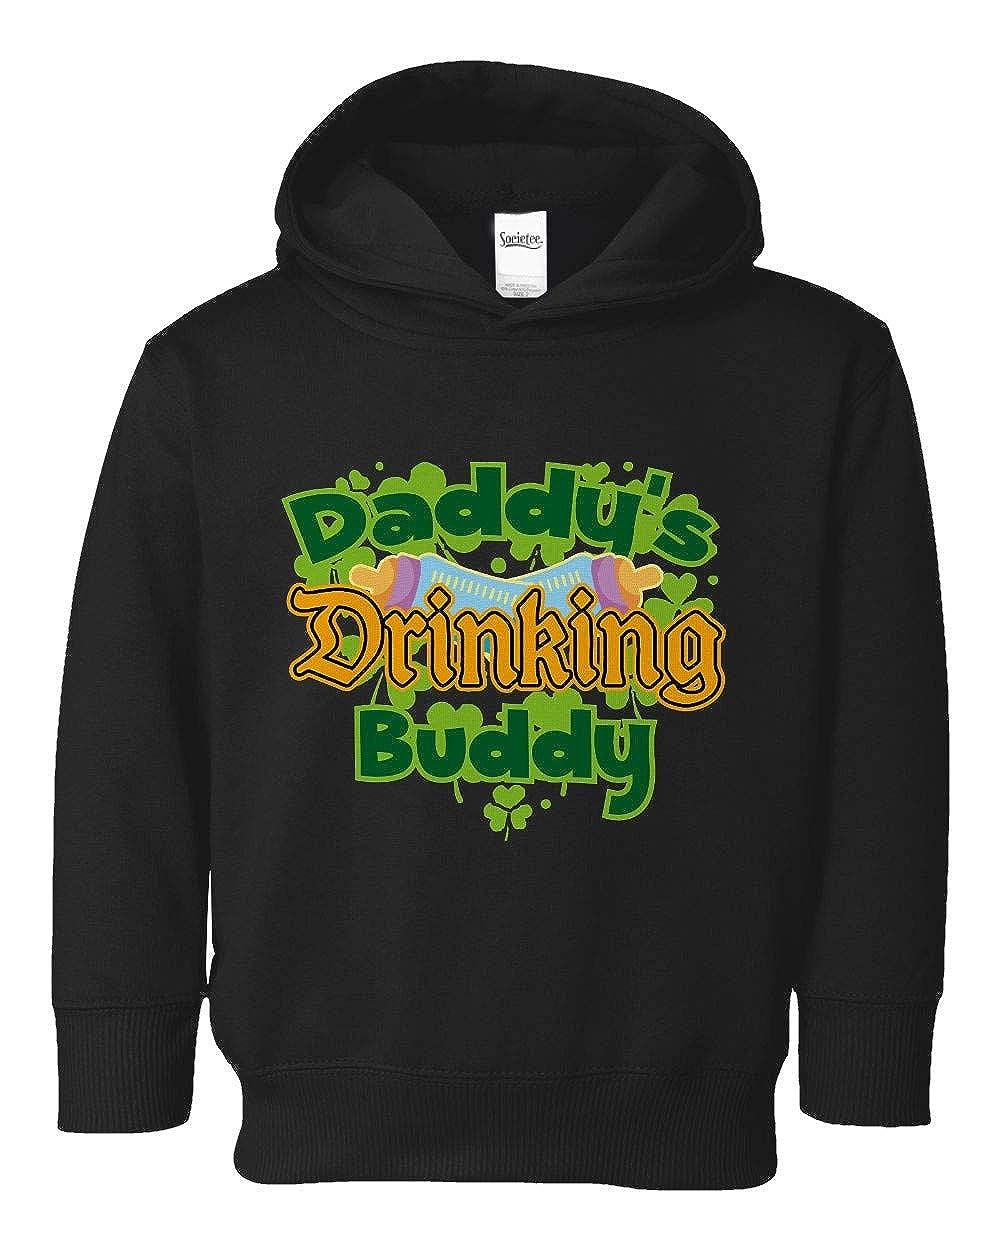 Societee Daddys Drinking Buddy Girls Boys Toddler Hooded Sweatshirt